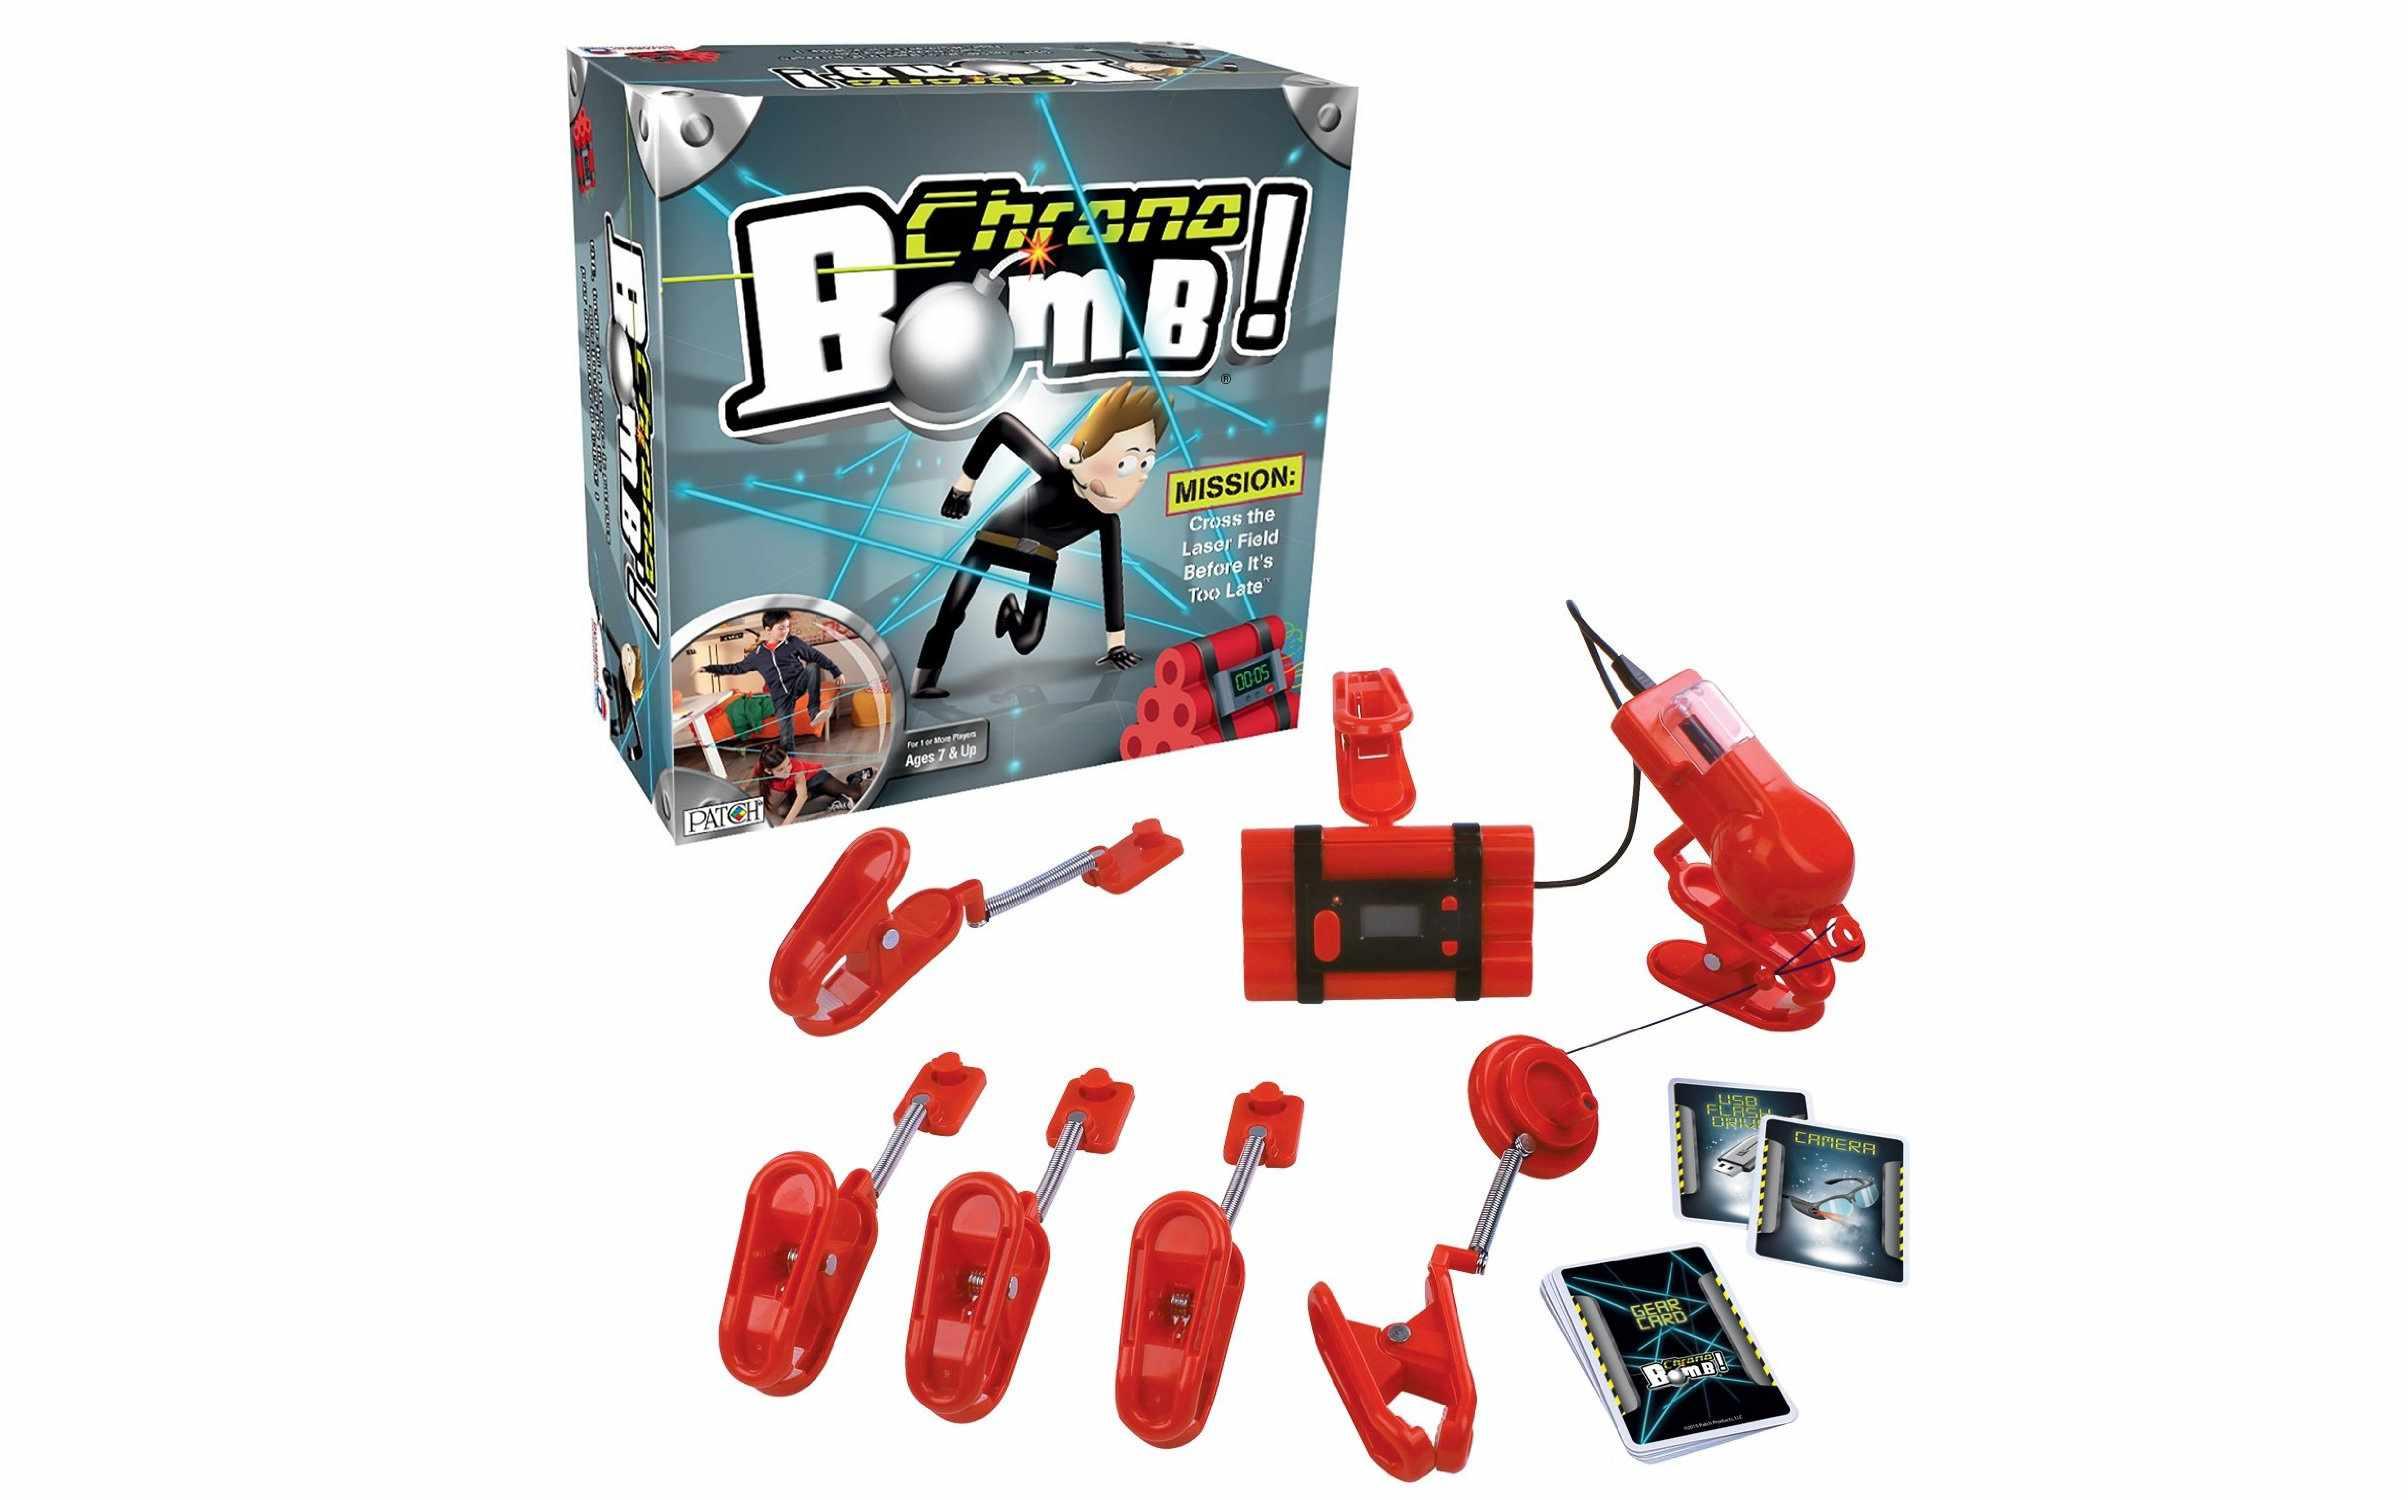 School-age toy: Chrono Bomb spy action game